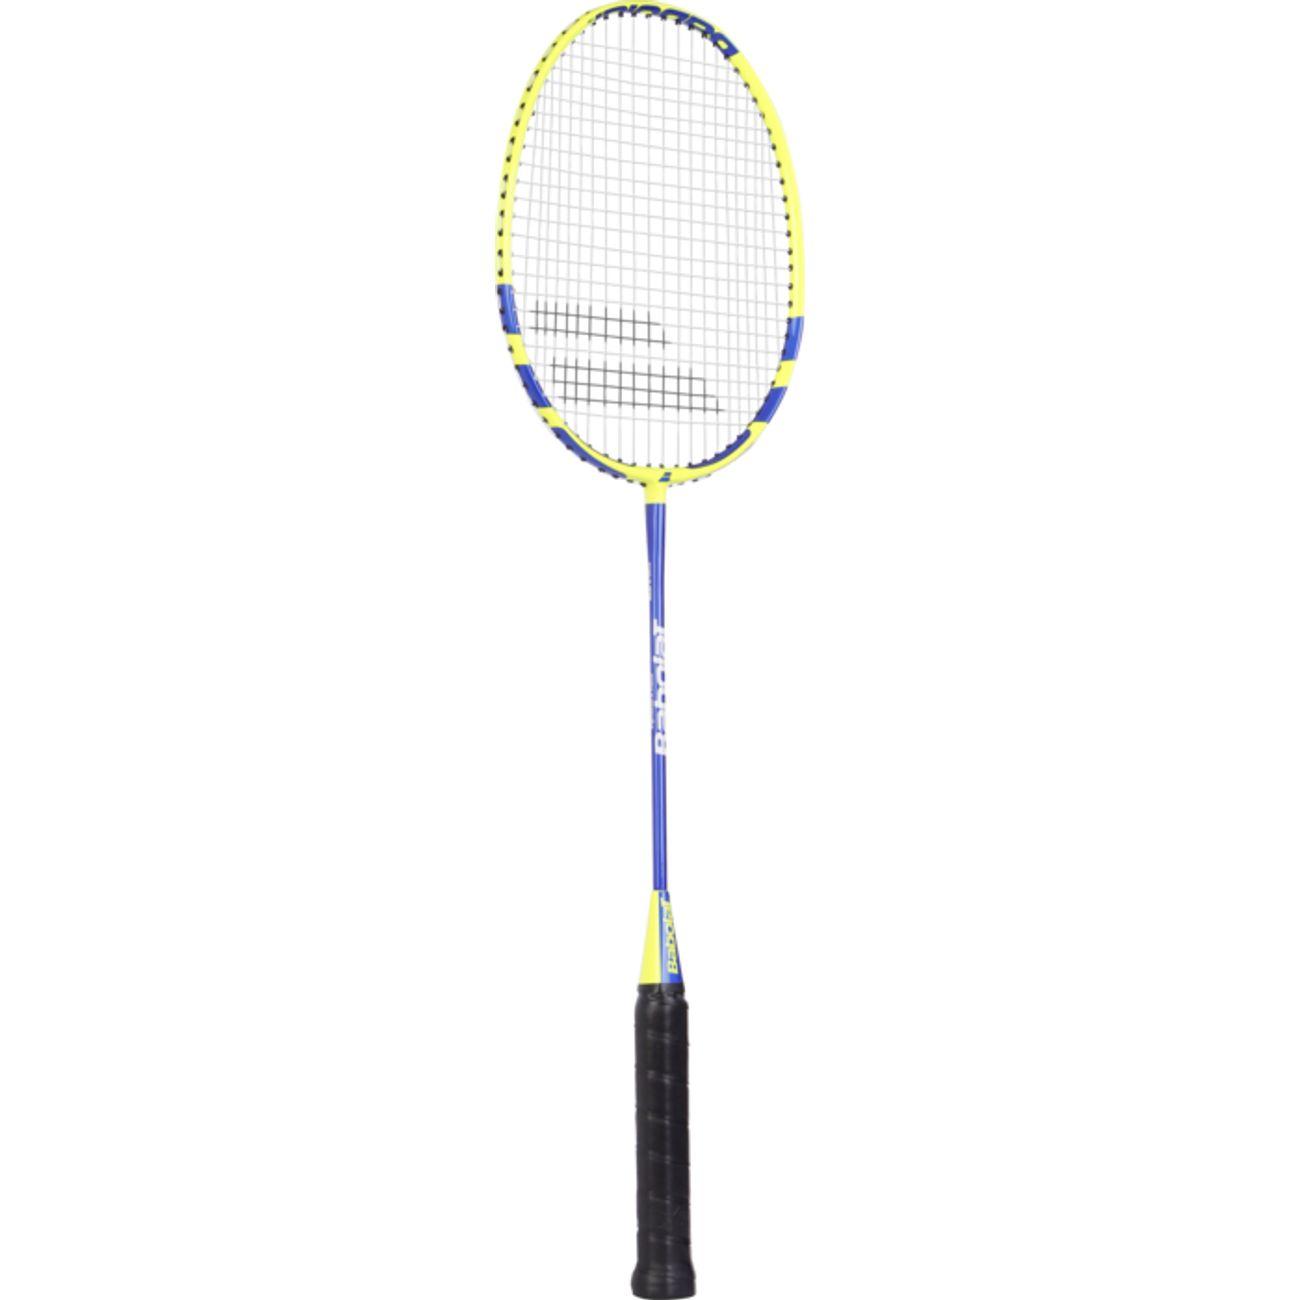 RAQUETTE Badminton adulte BABOLAT SPEEDLIGHTER S